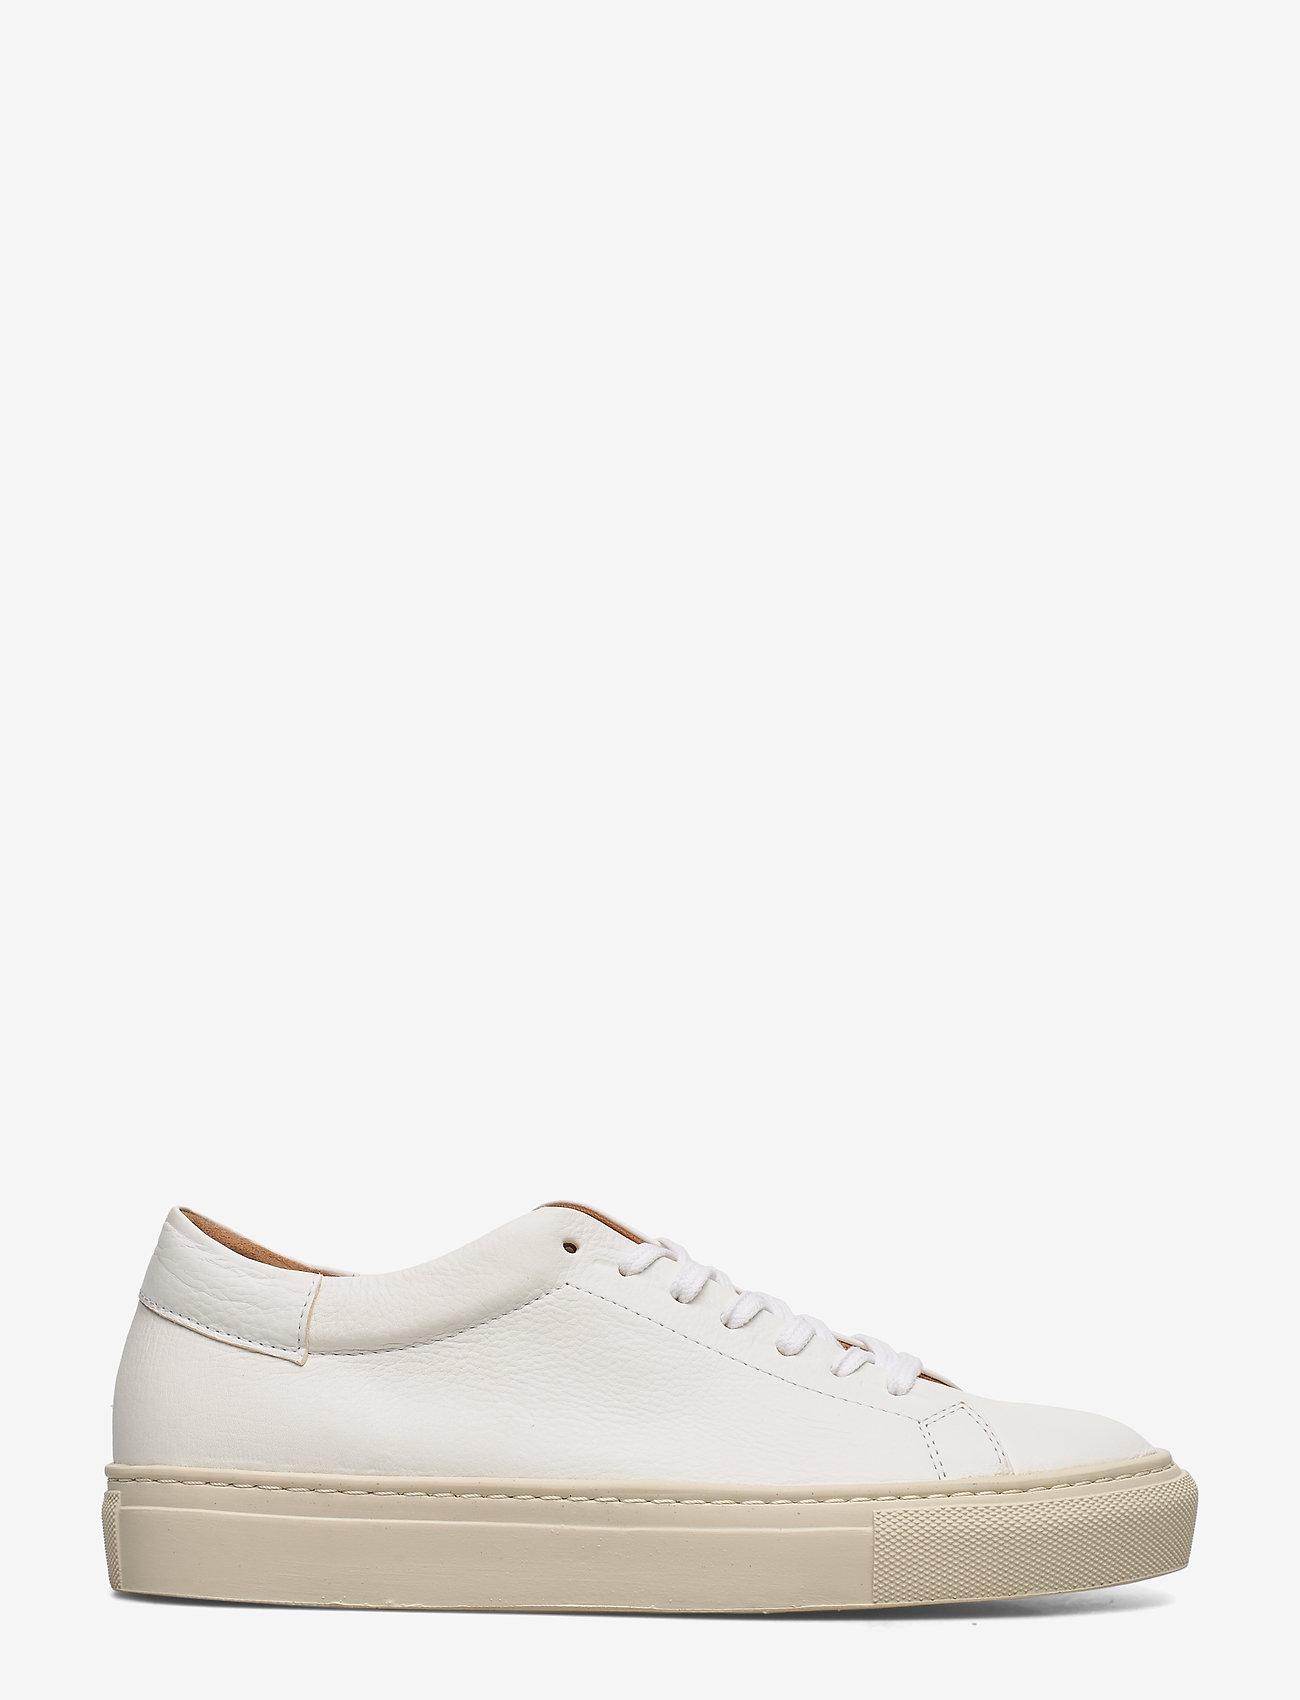 Flattered Stockholm White Leather Sneaker- Baskets 3f5ibpFd fe4uA Uzpb3iak